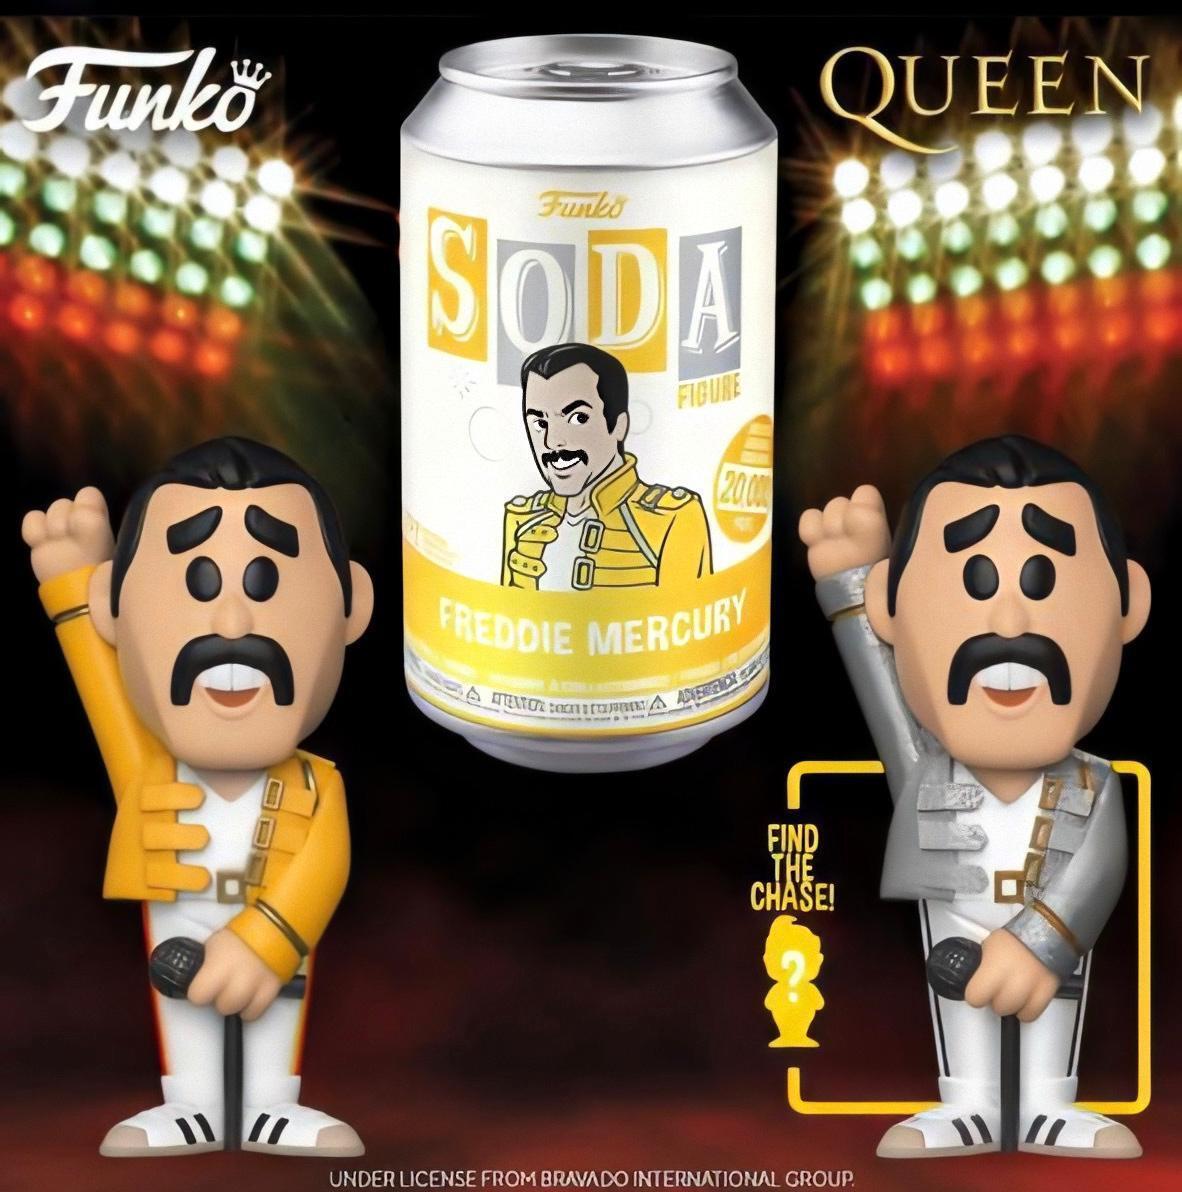 PRÉ VENDA: Lata Pop! Freddie Mercury: Vinyl Soda: (Edição Limitada) - Funko